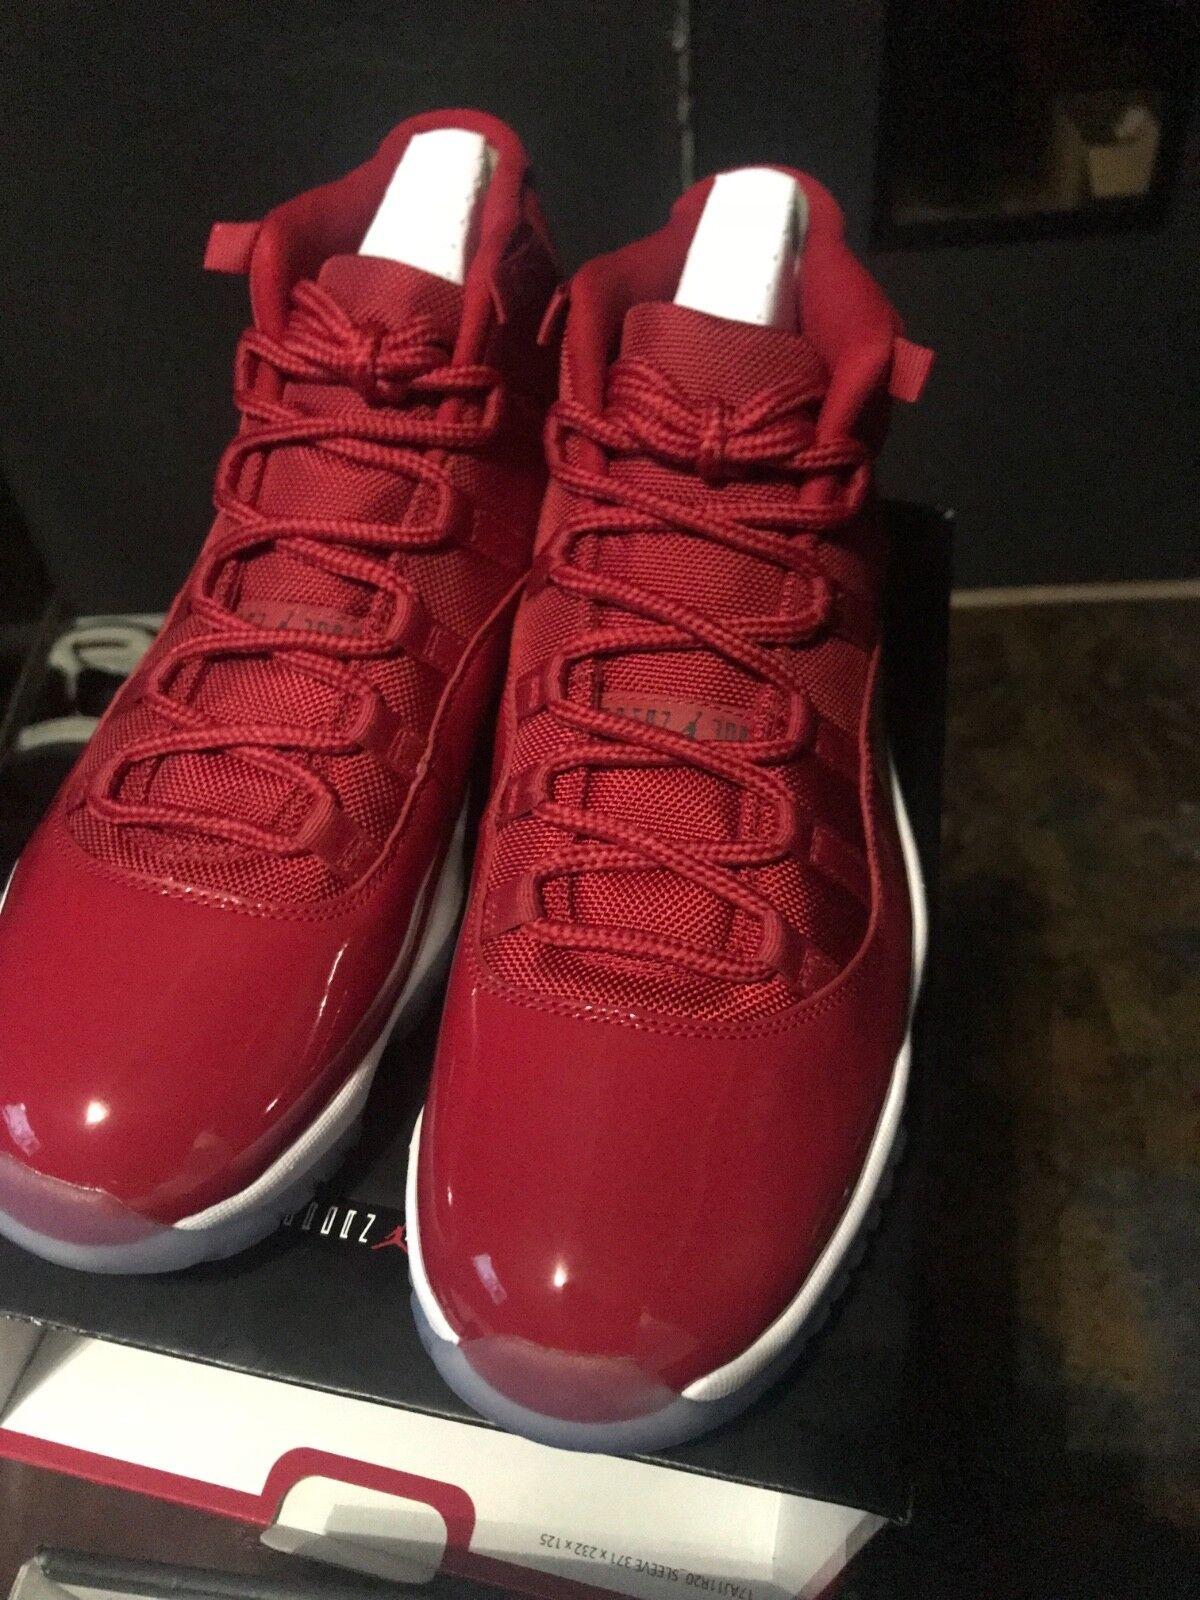 Nike Air Jordan 11 Win Like 96 XI Retro Gym Red